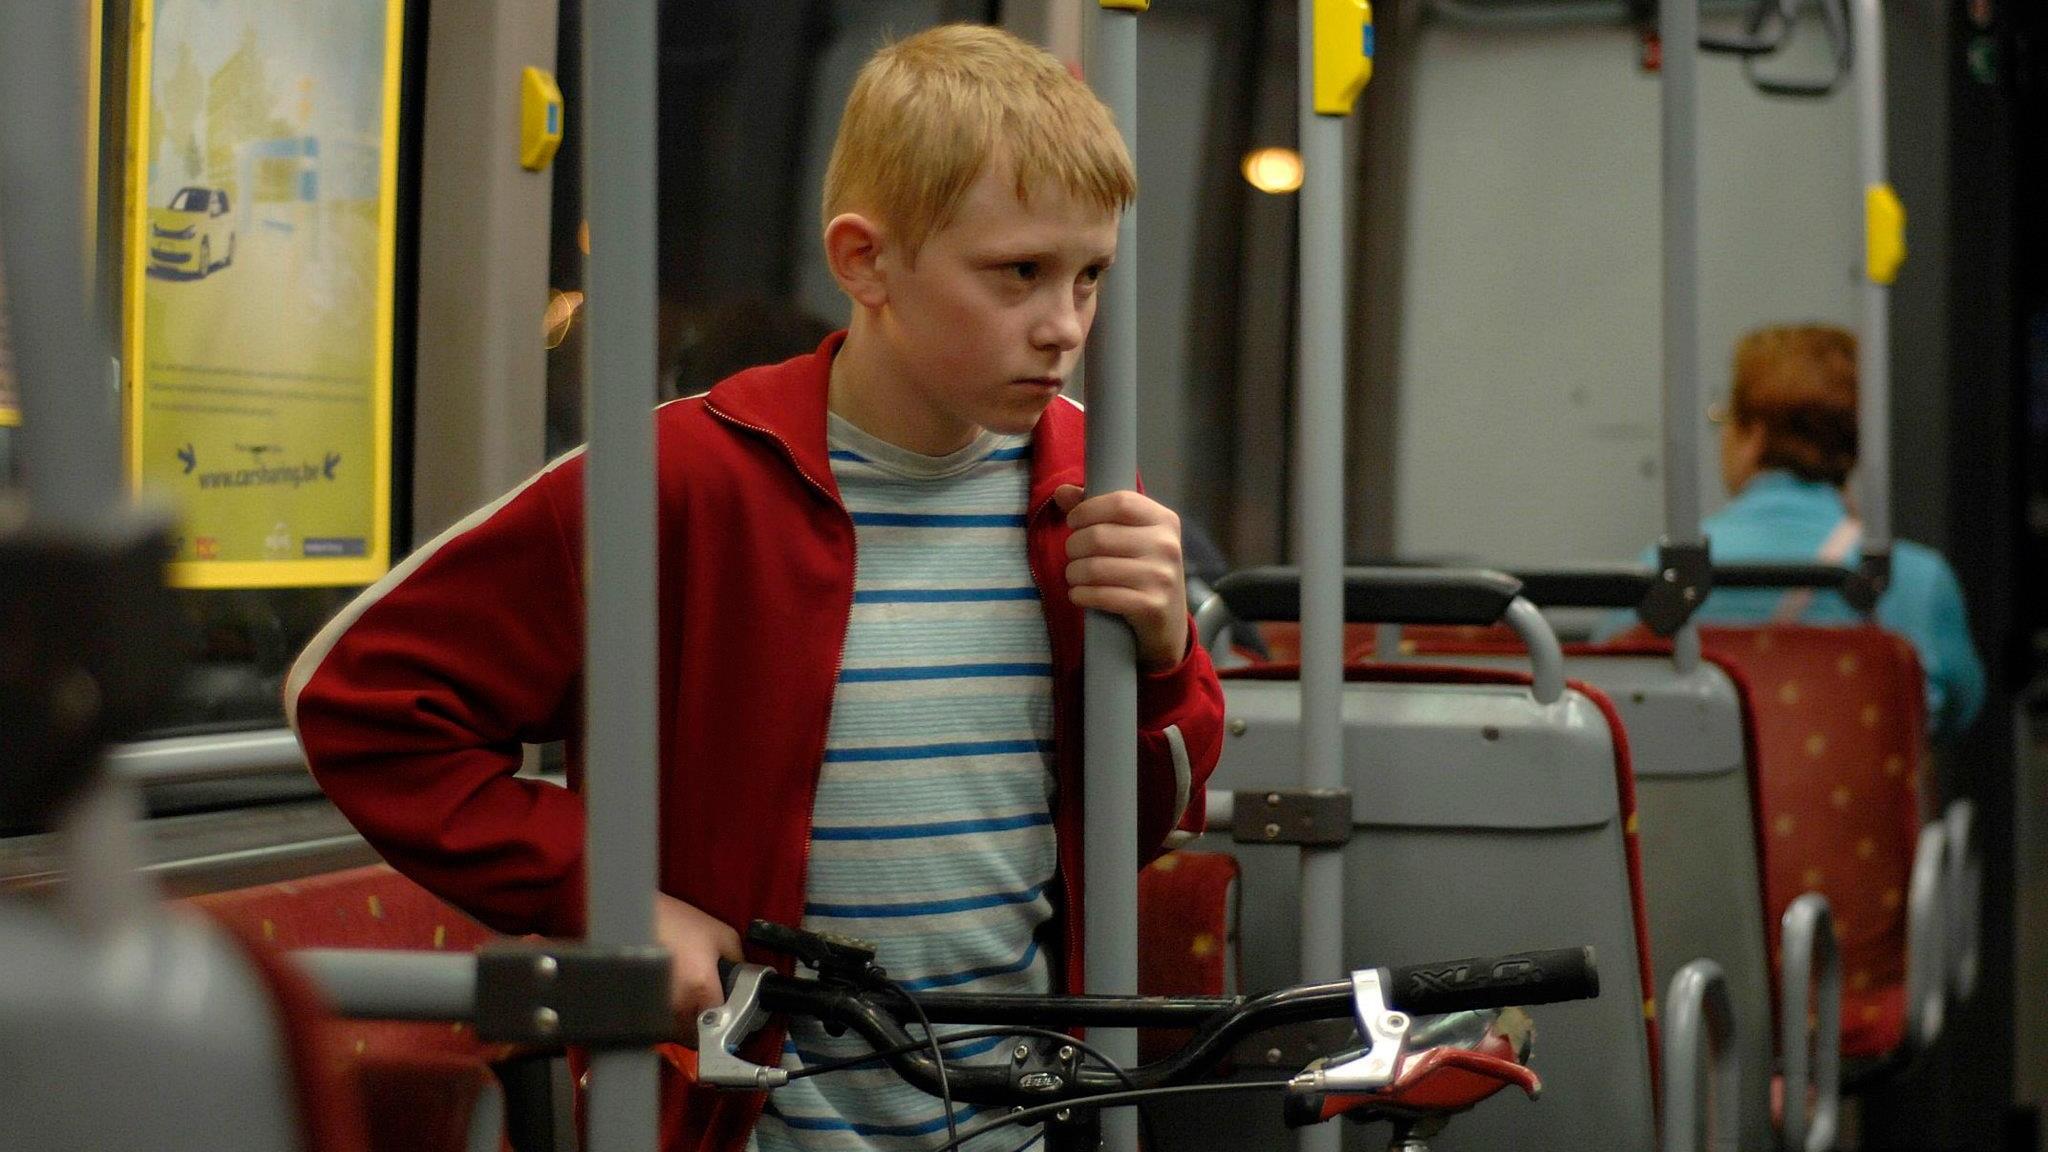 the-kid-with-a-bike-whysoblu.com-1.jpg